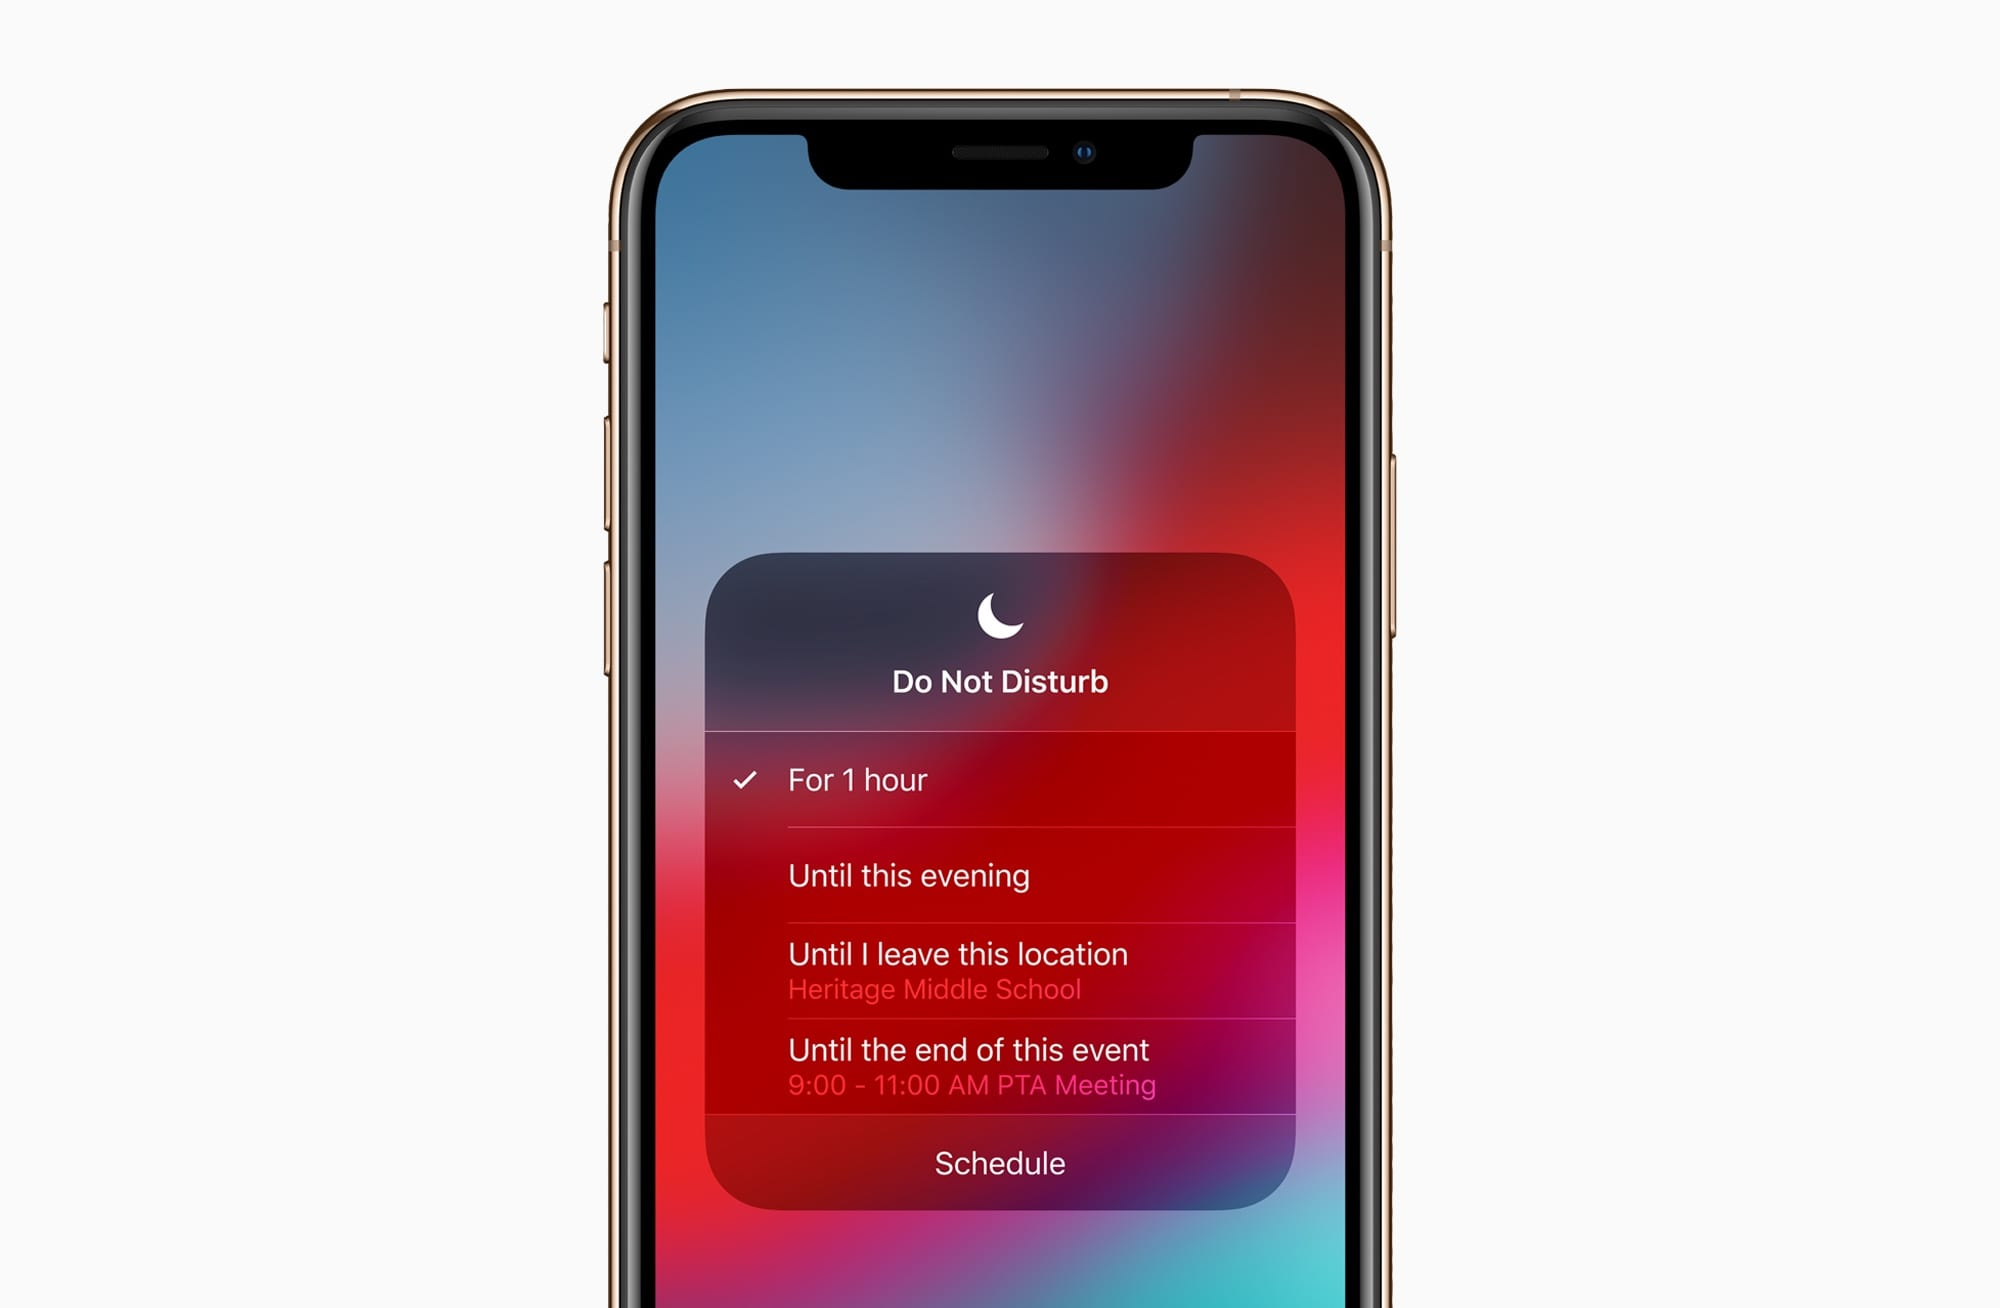 iOS12 iPhoneXs DoNotDisturb 09172018 - Apple vydal iOS 12 s vylepšeniami výkonu, Memoji, Siri Shortcuts a ďalšími novinkami